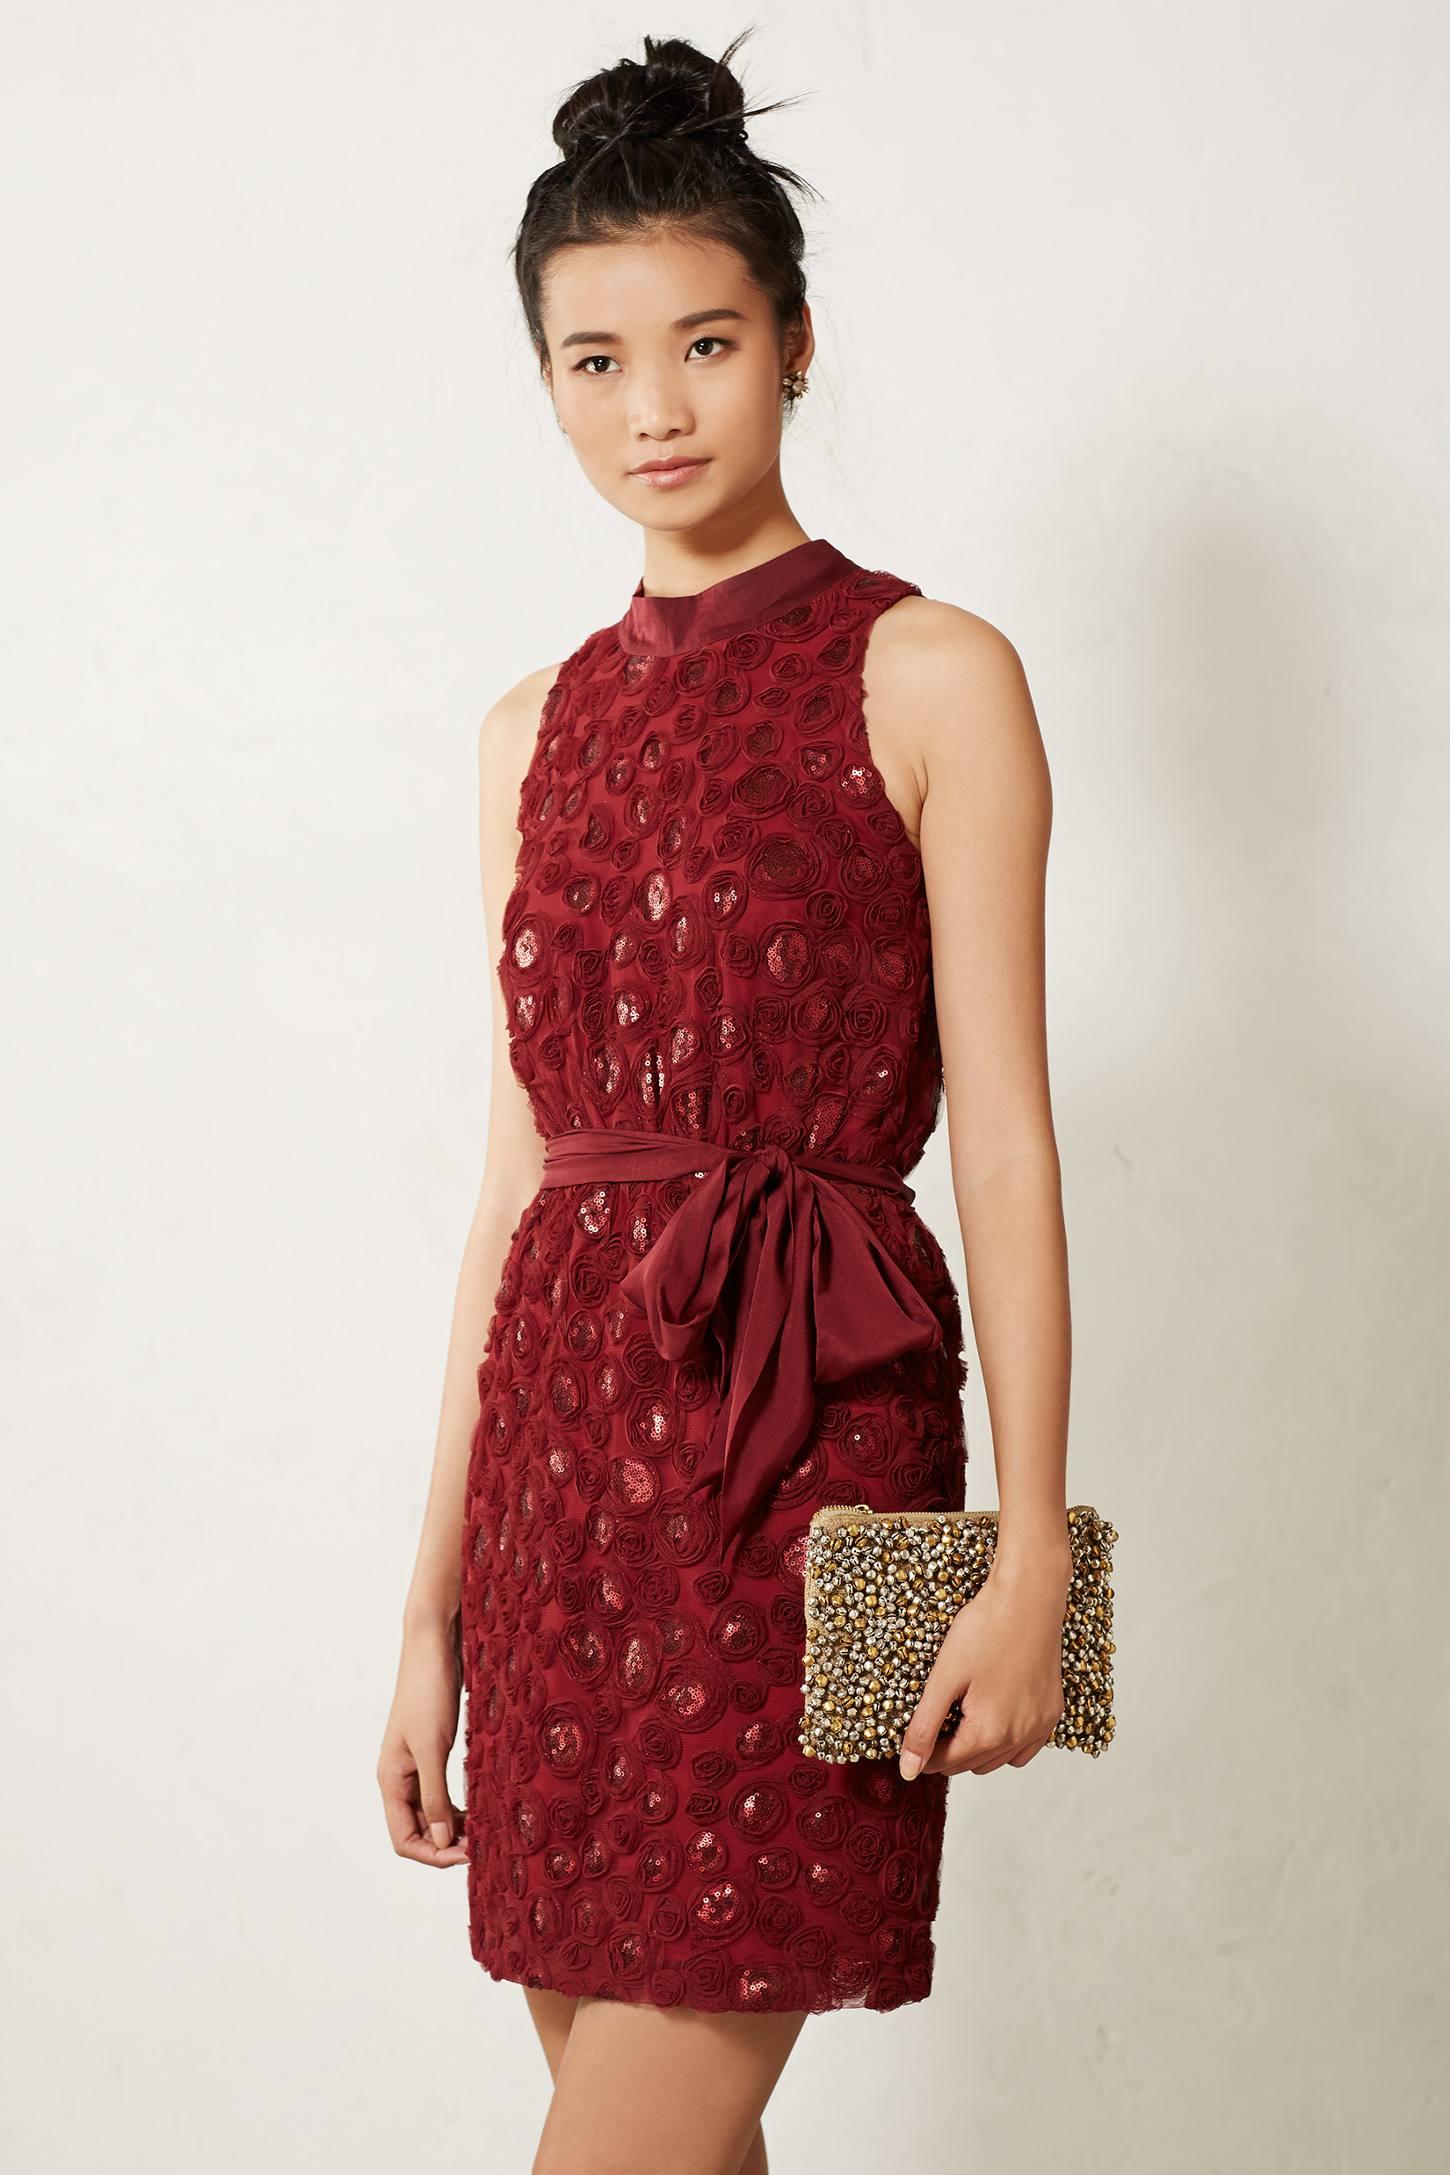 Lyst Sachin & Babi Sequin Cutout Dress in Red